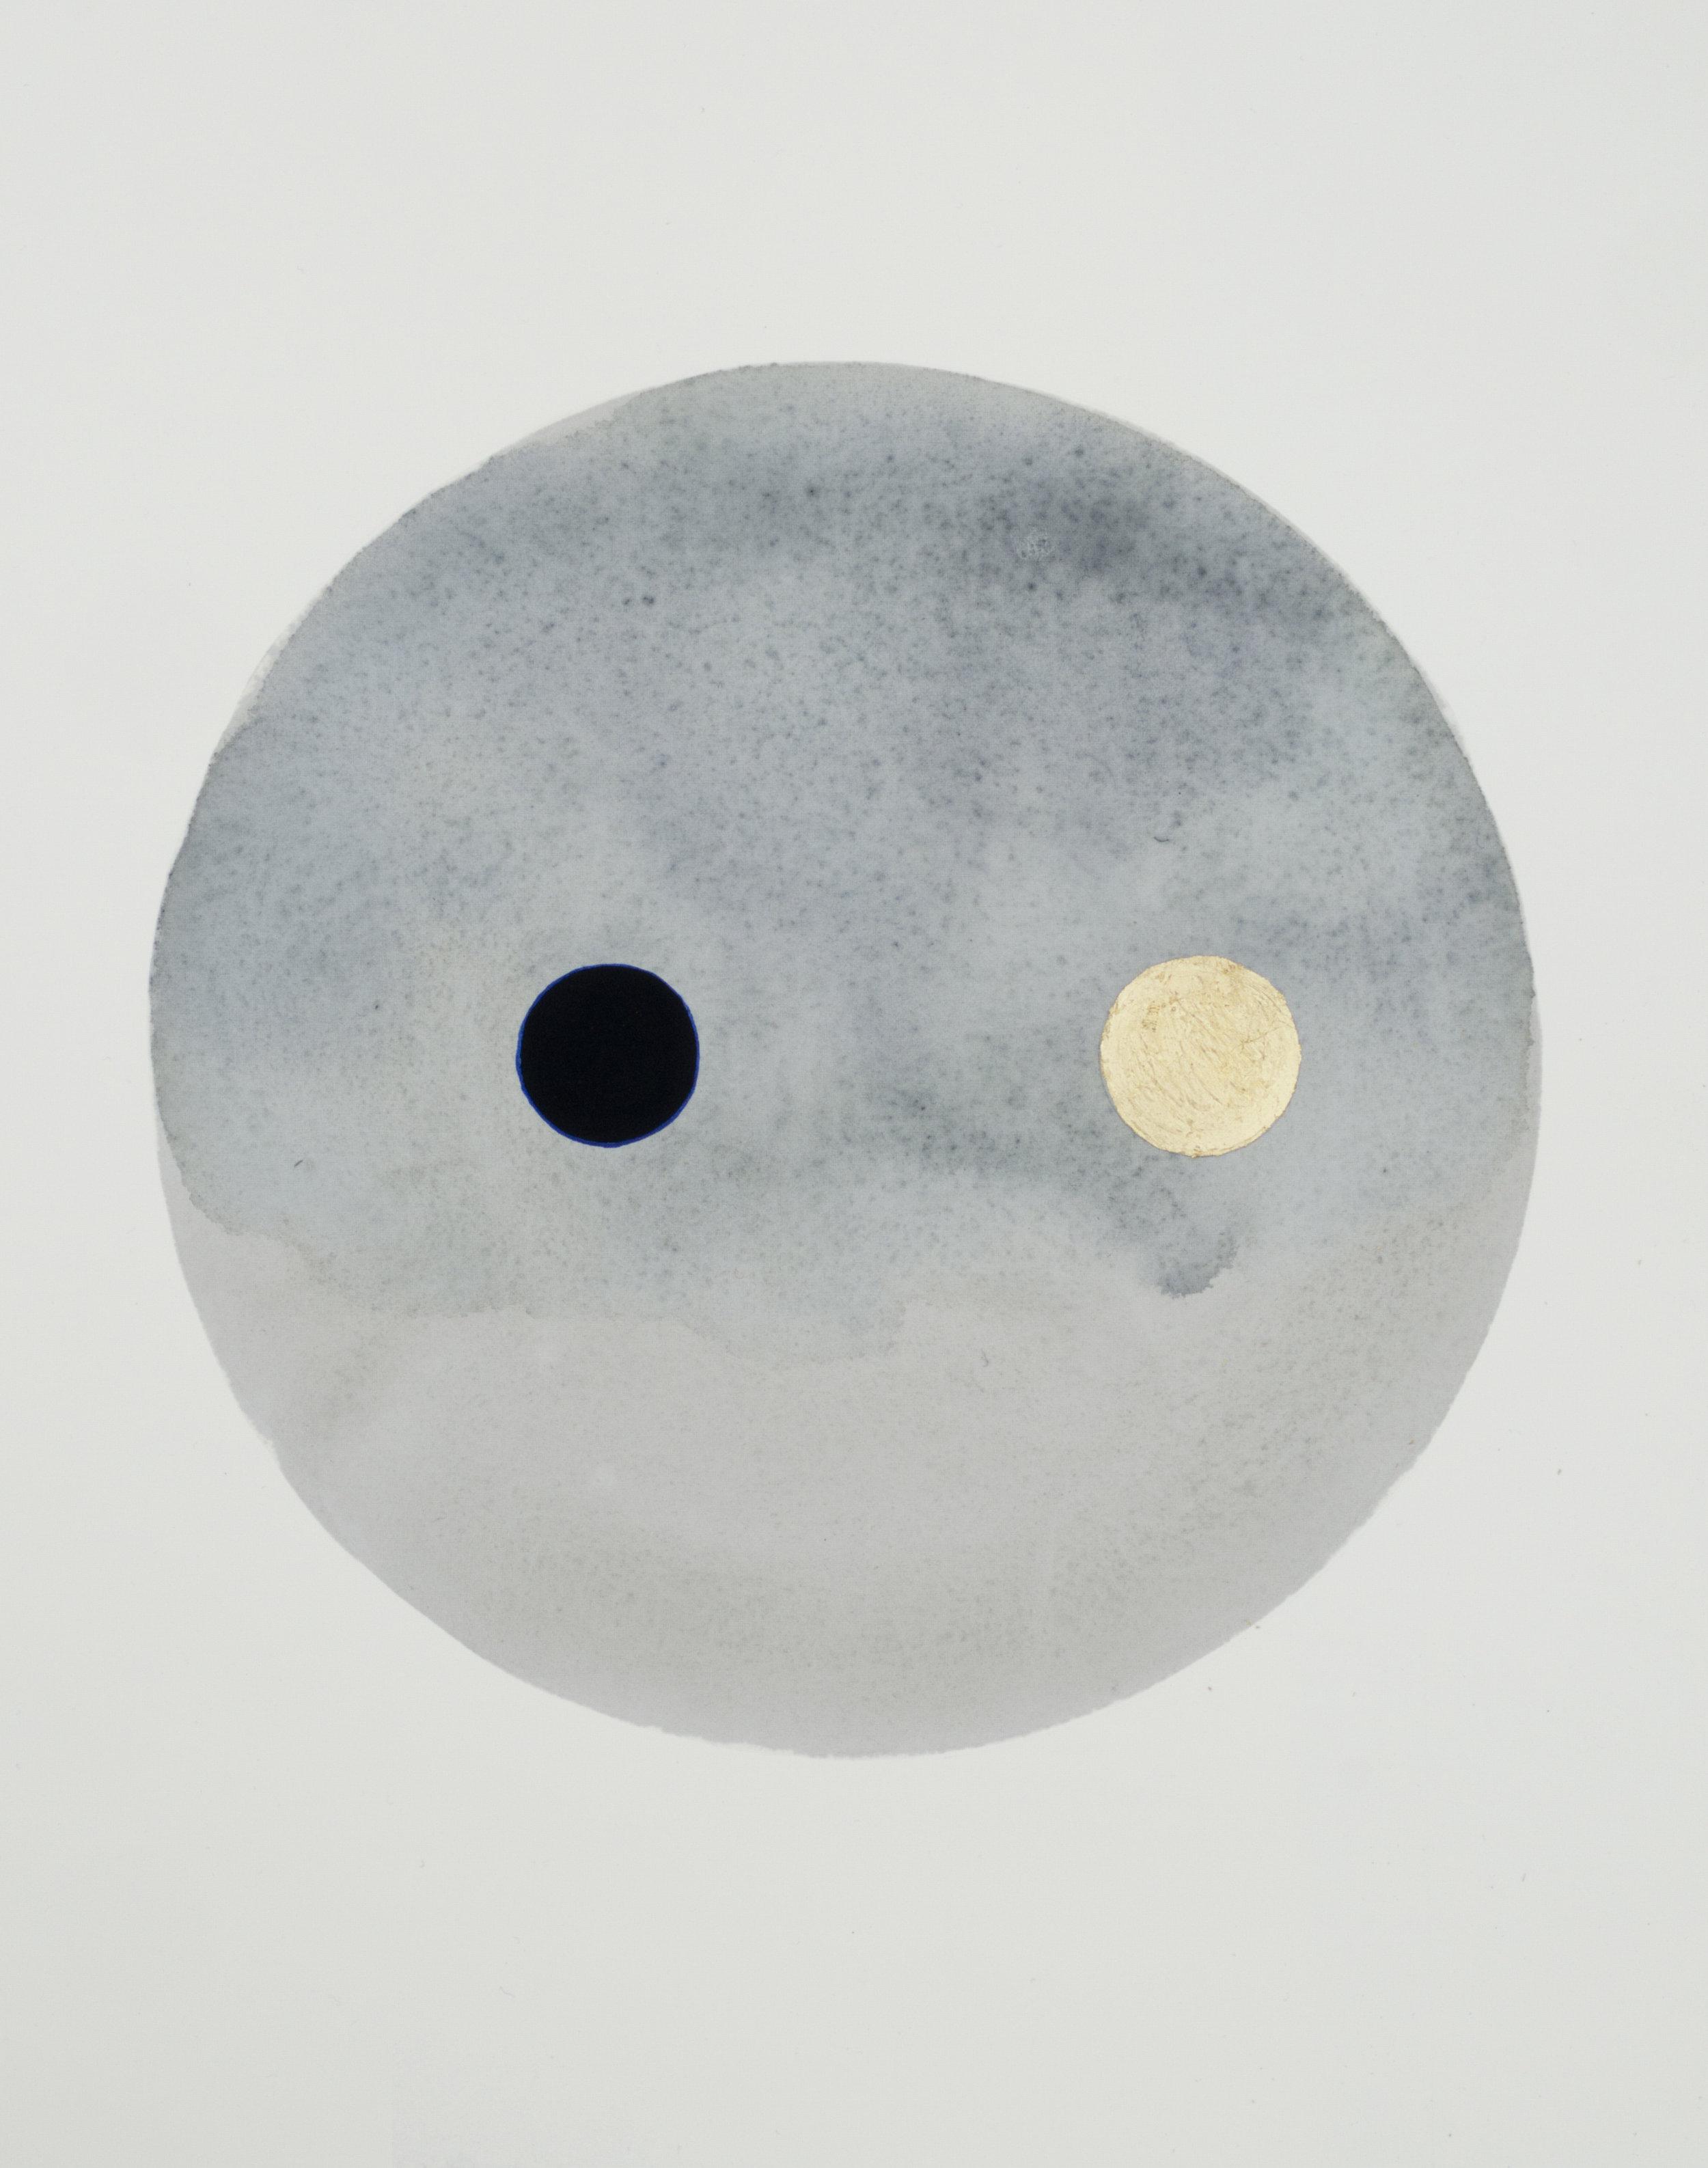 Simon MacEwan, Transit 10, 2017, Watercolour, Gouache and 23k Gold Leaf on Paper